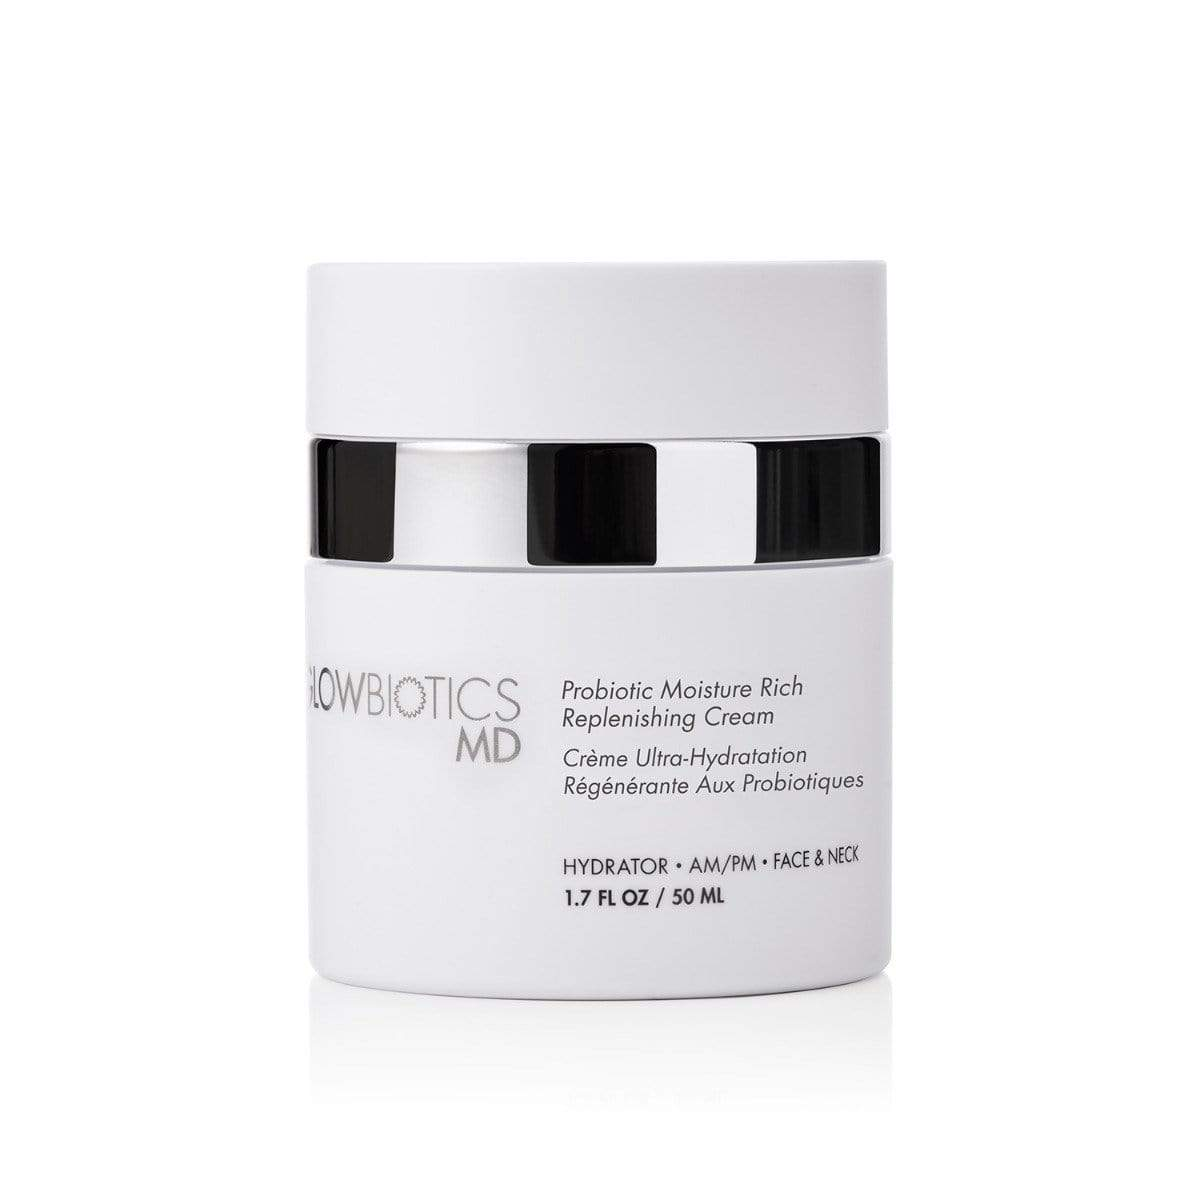 Moisture Rich Replenishing cream